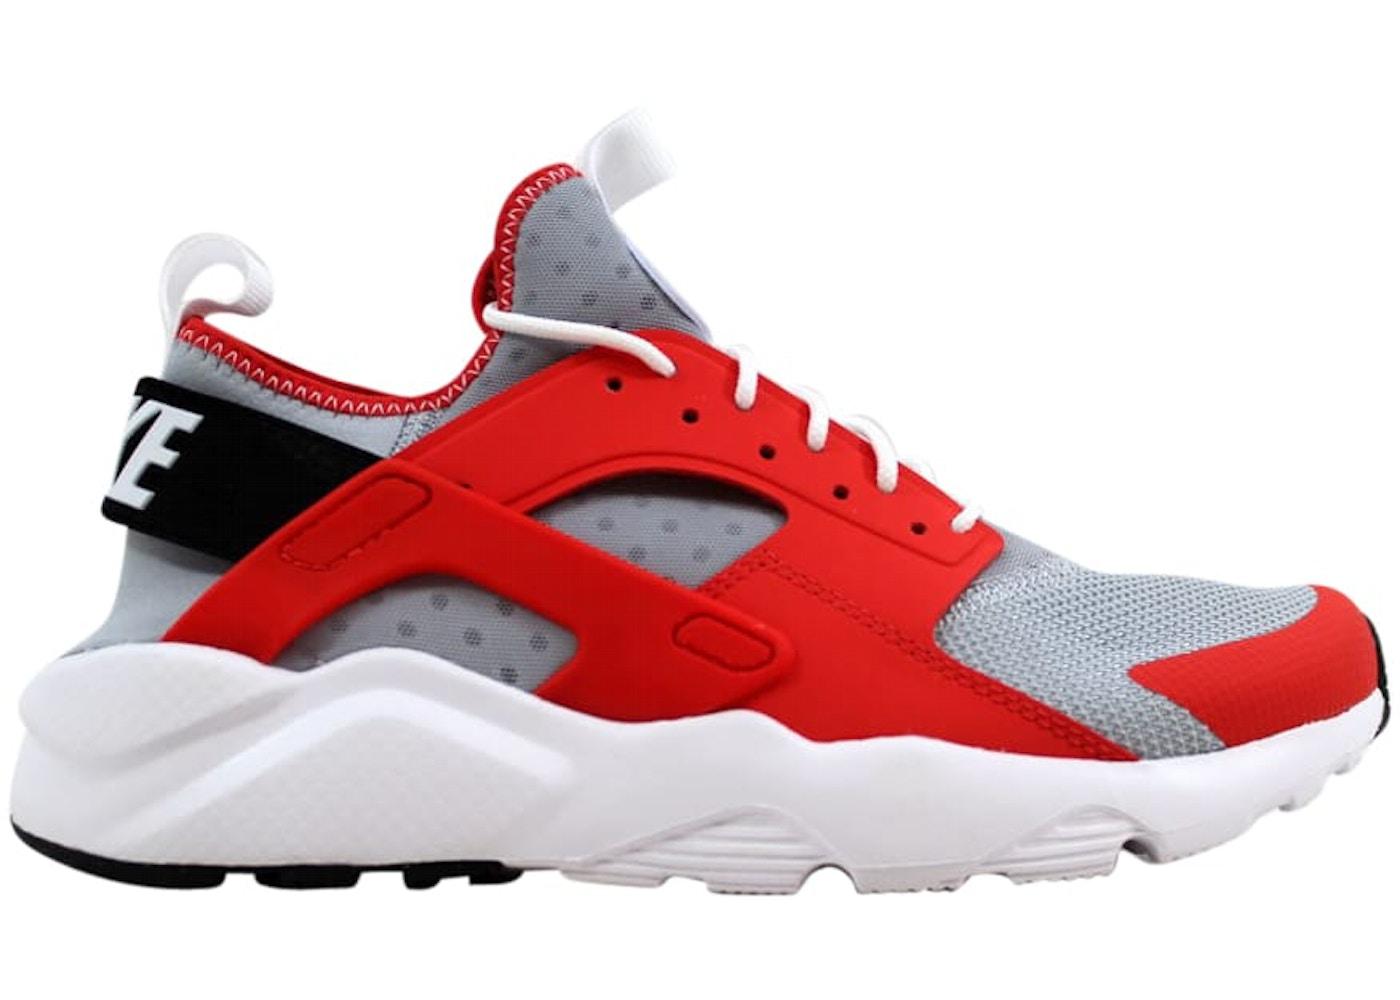 c4f4e667e92ce Nike Air Huarache Run Ultra Max Orange - 819685-800